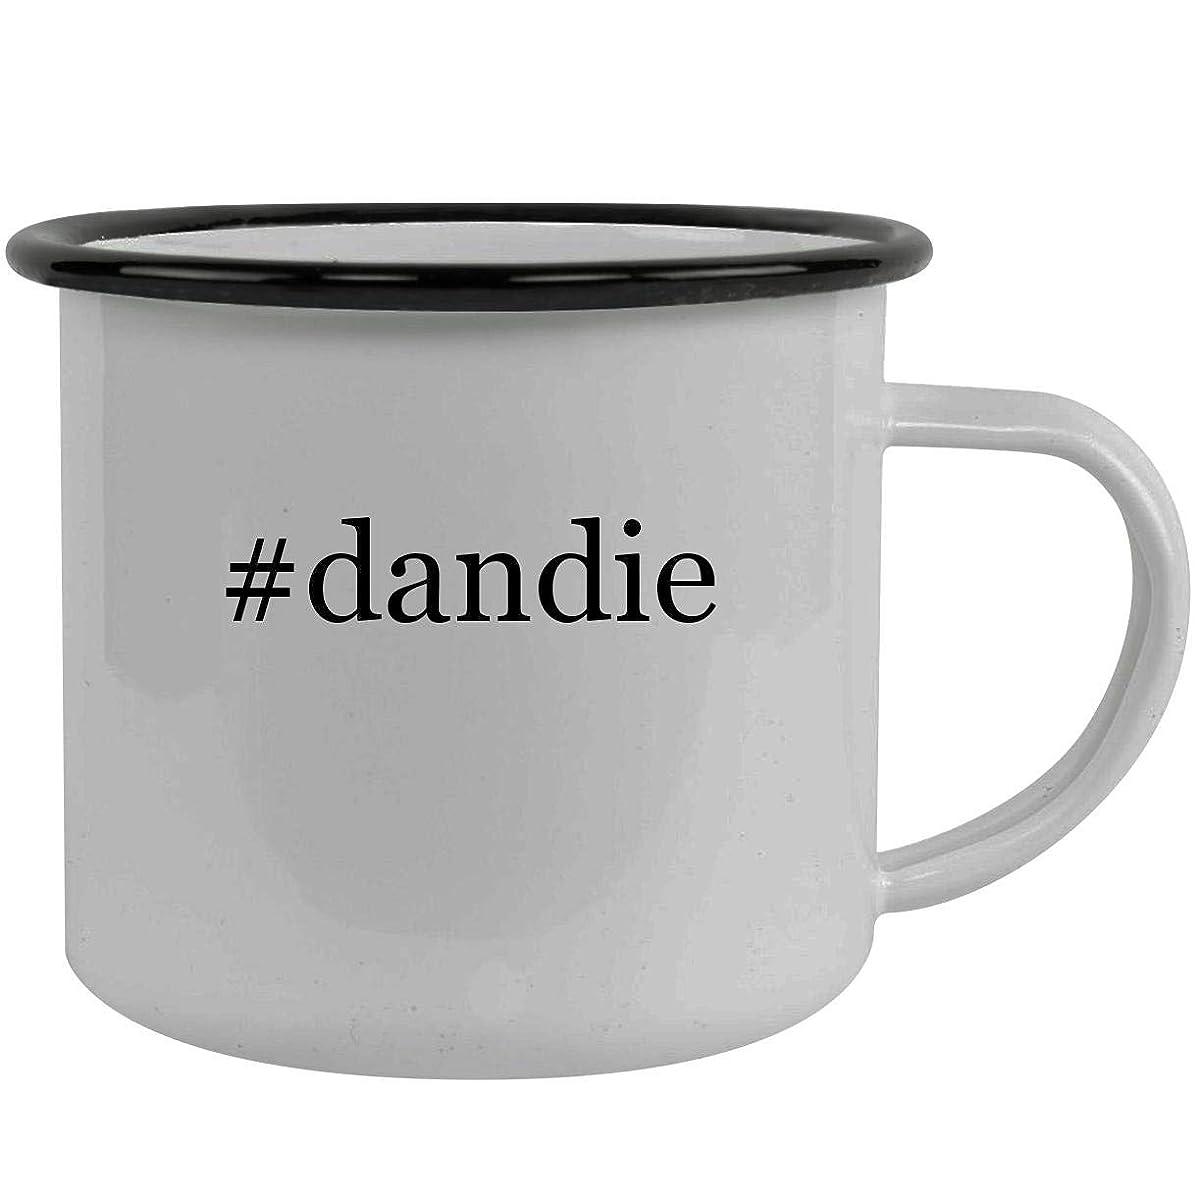 #dandie - Stainless Steel Hashtag 12oz Camping Mug, Black